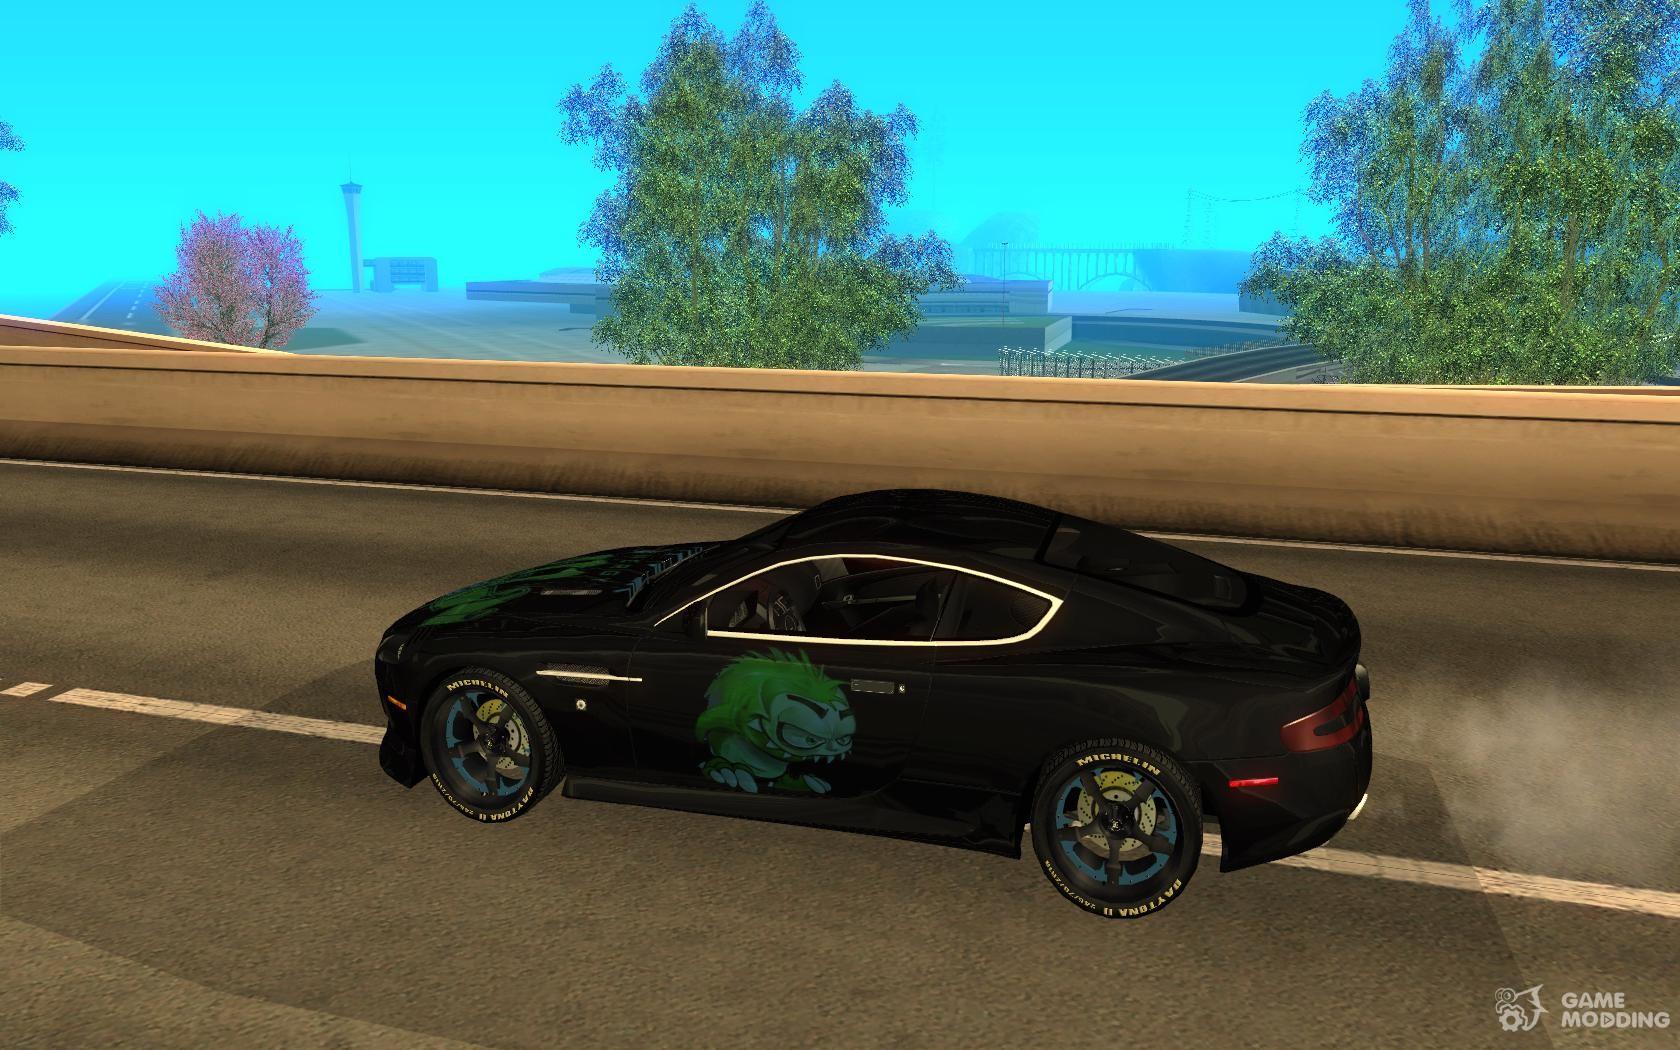 Aston Martin Db9 Nfs Ps Tuning For Gta San Andreas